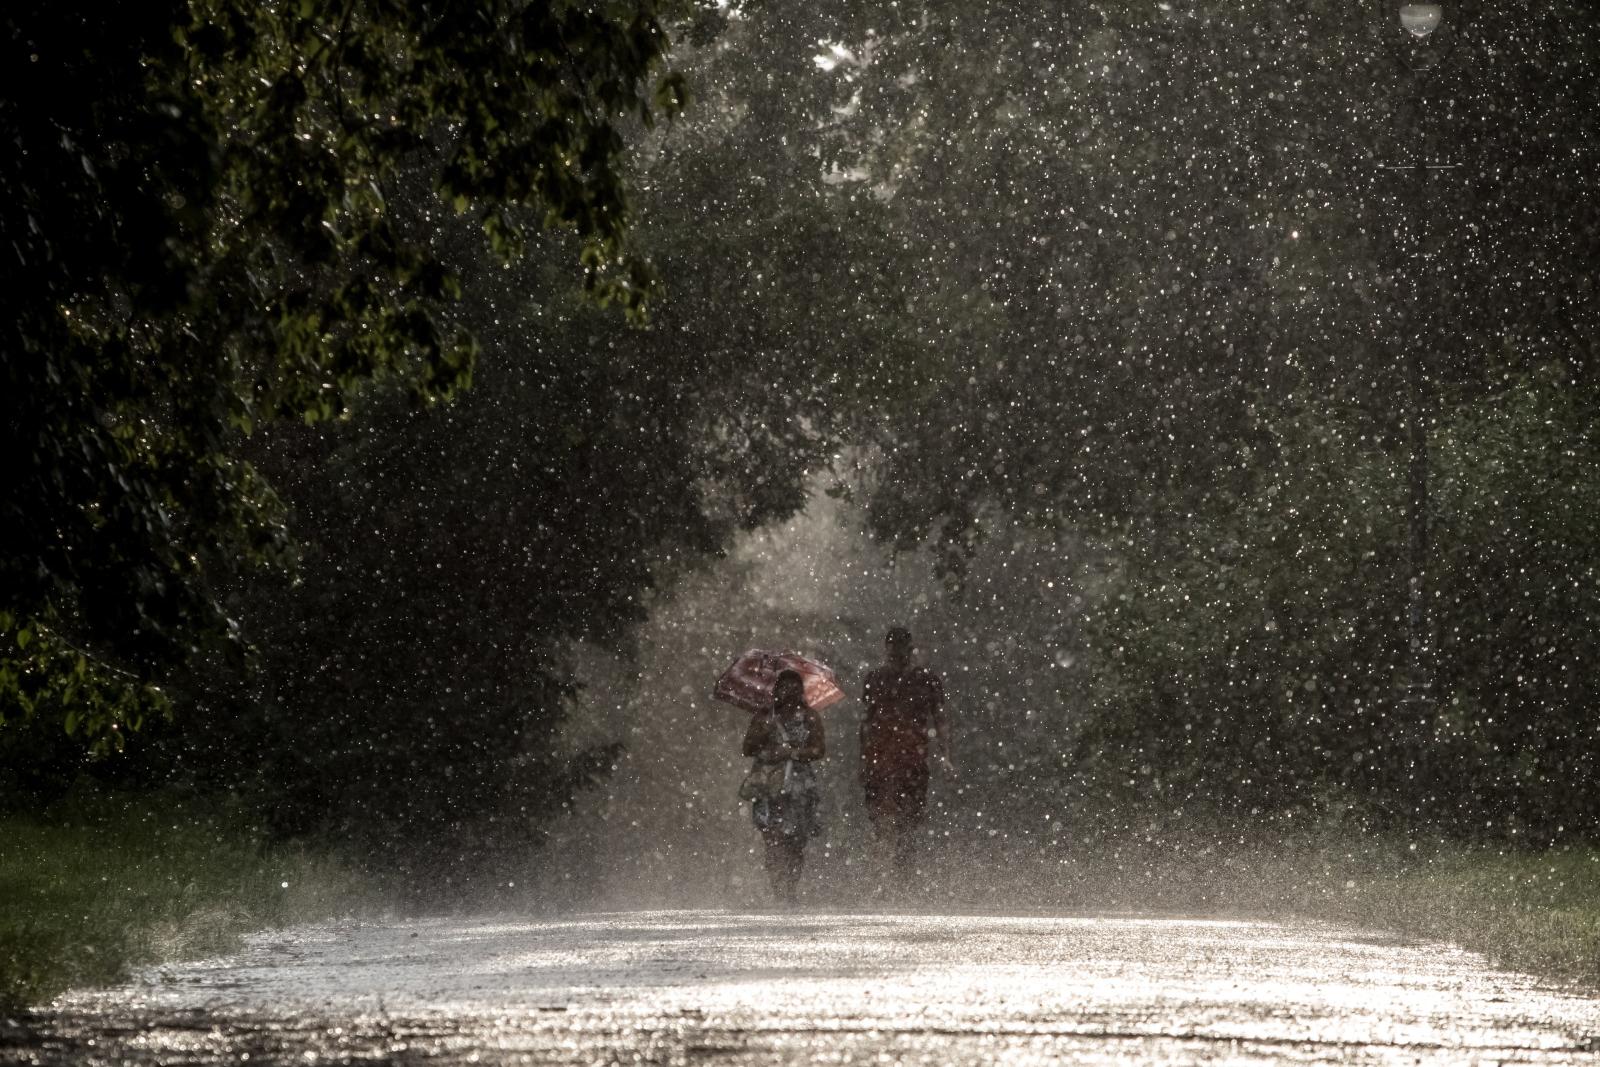 Aktualna pogoda w Czechach. Fot. EPA/MARTIN DIVISEK